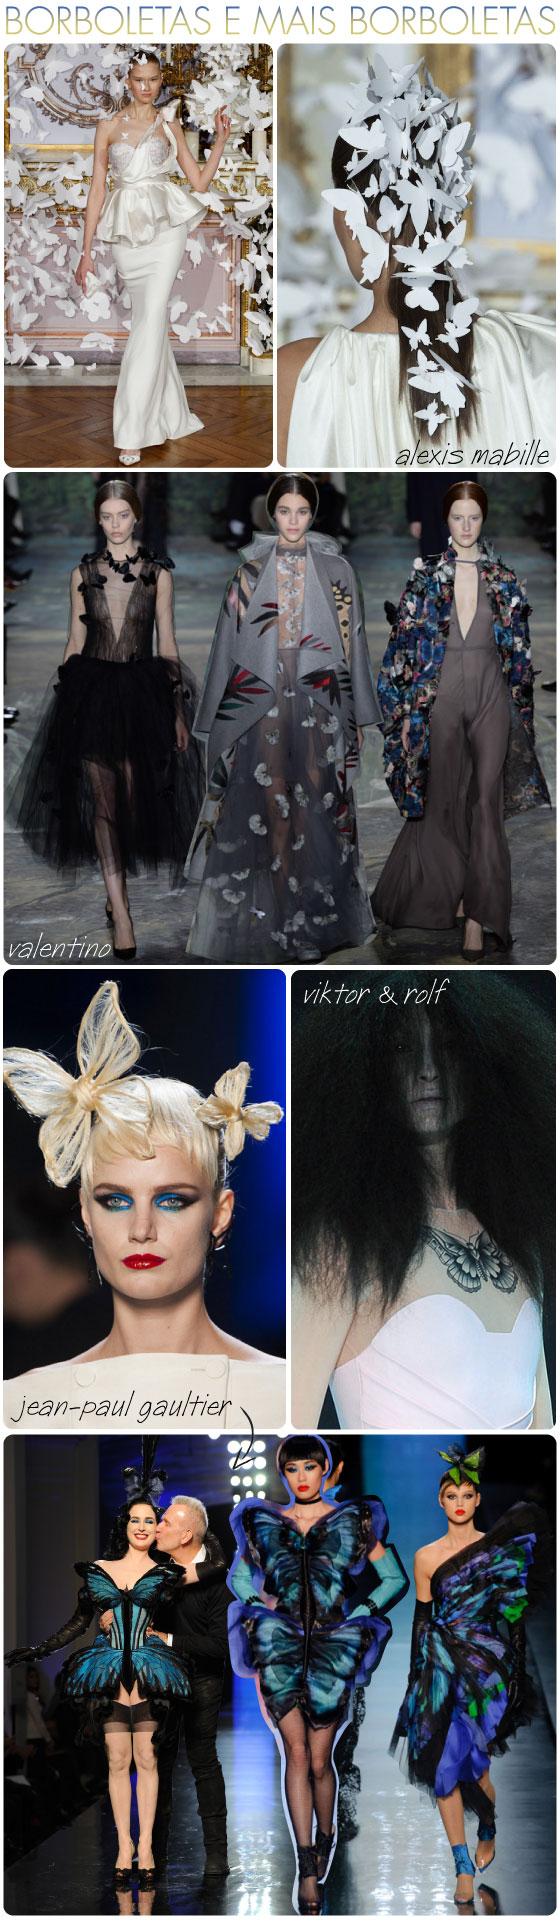 borboletas-semana-alta-costura-tendencia-trend-butterfly-gaultier-viktor-rolf-valentino-alexis-mabille-desfile-spring-2014